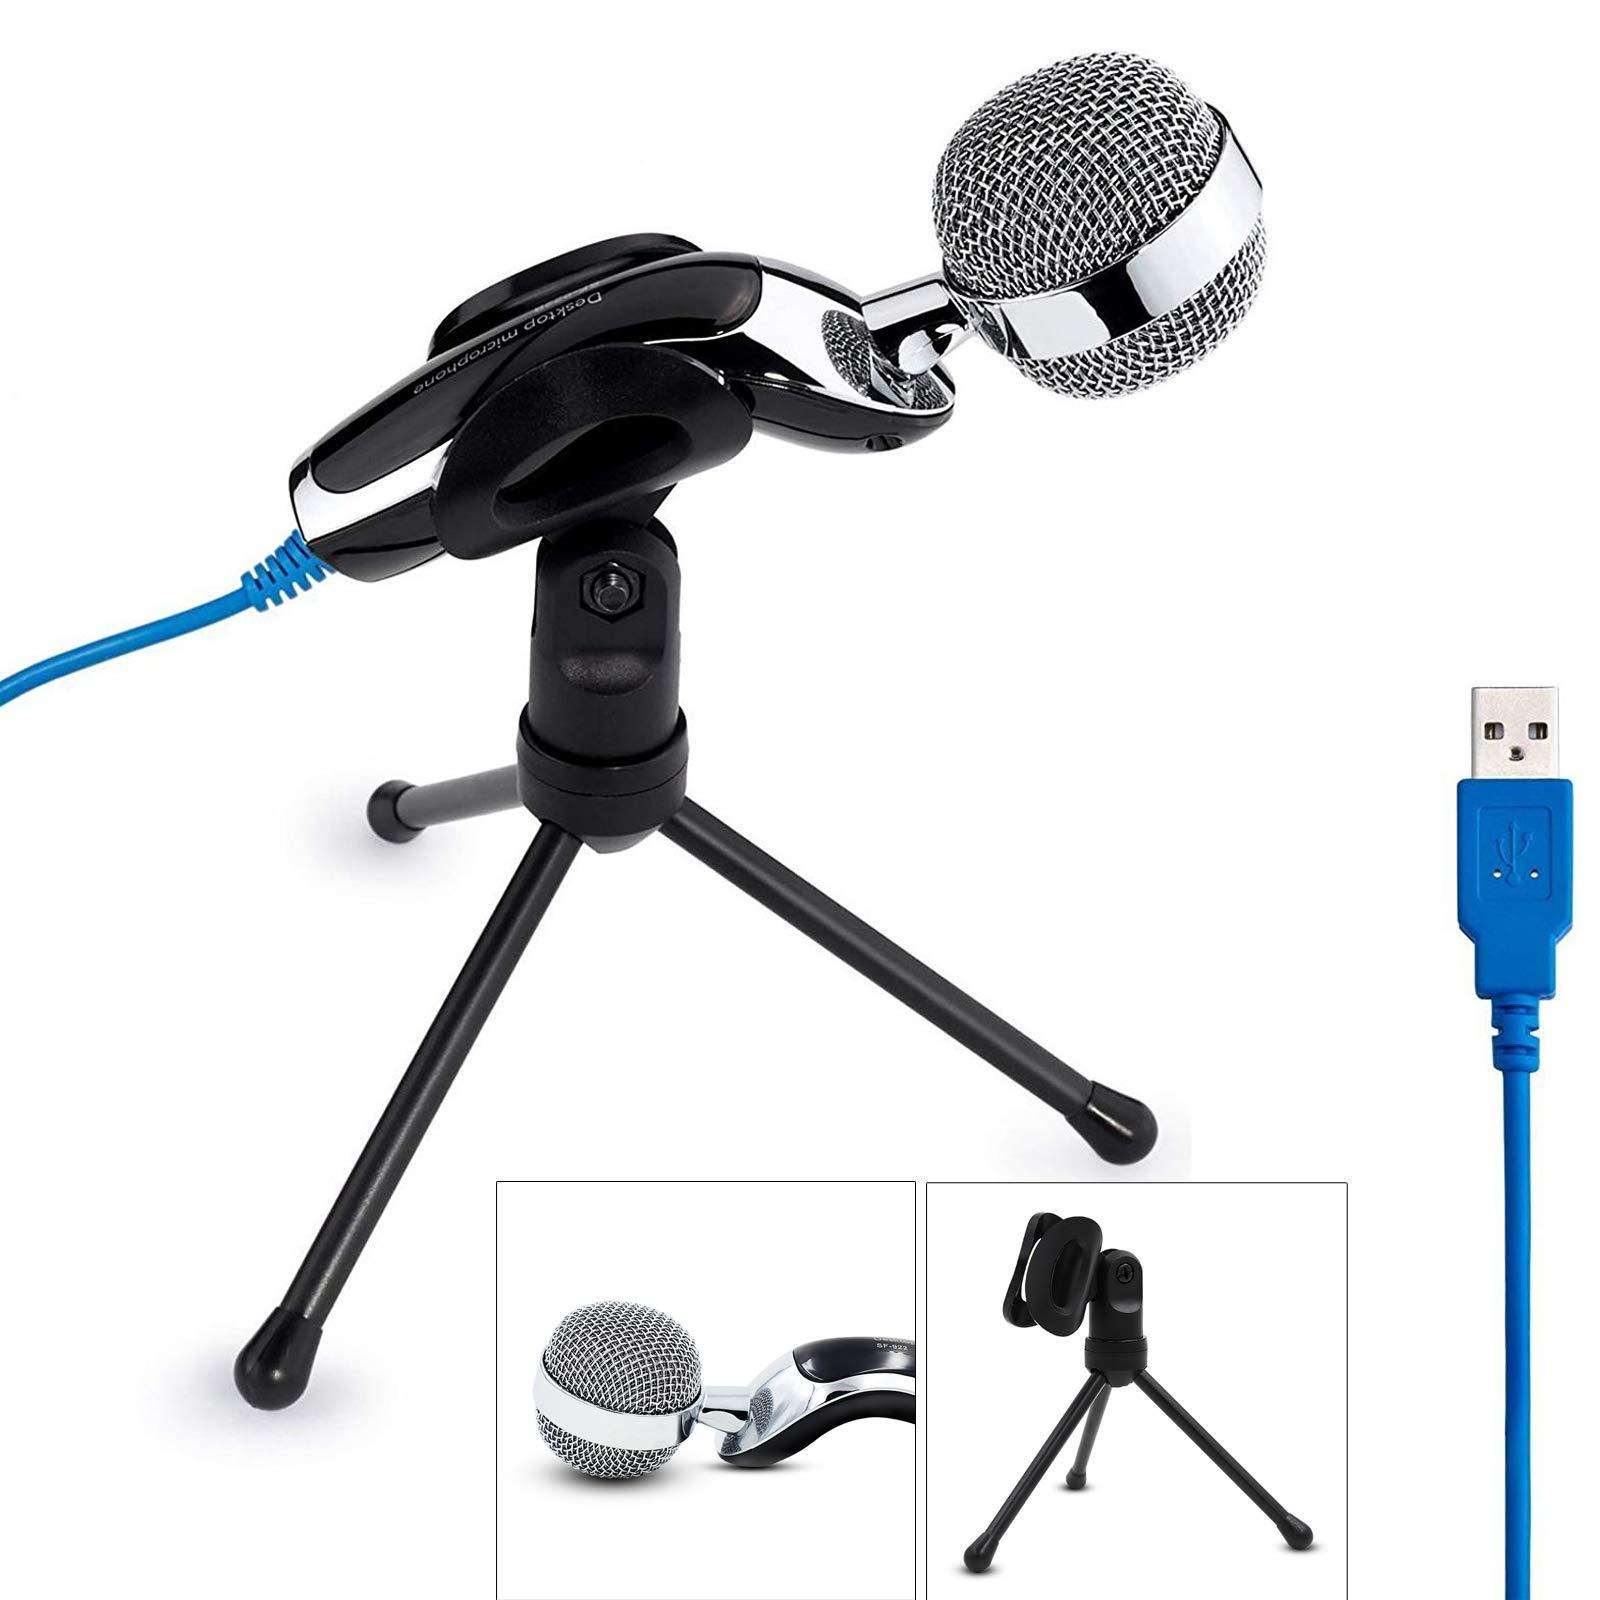 Micrófono USB Plug Play Home Studio Micrófono de condensador USB para PC Computadora portátil de escritorio Grabación id